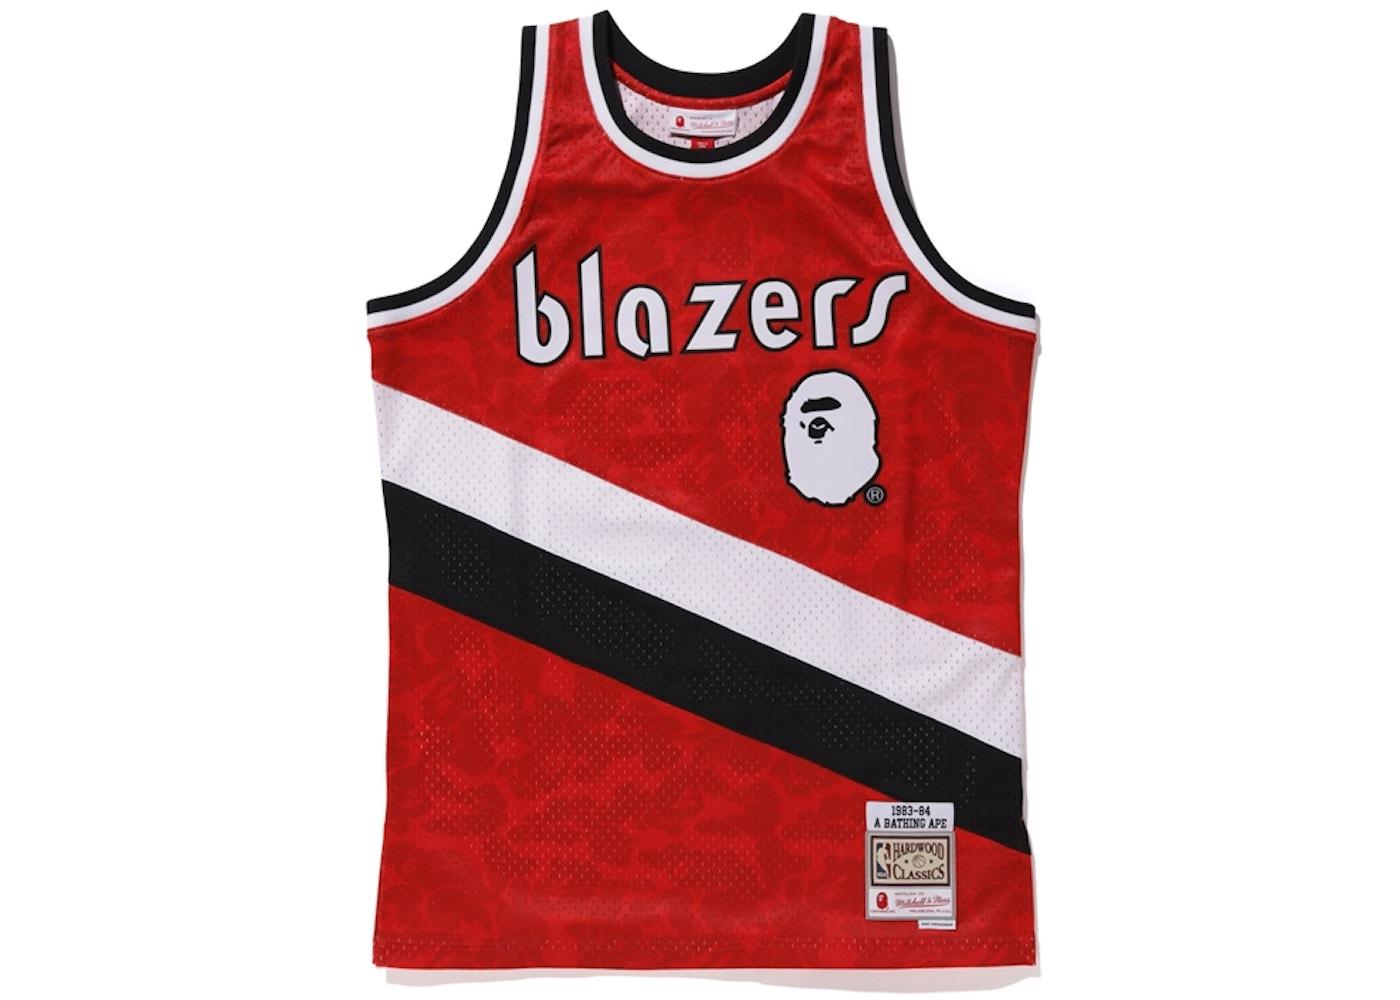 2afc6bb2 BAPE x Mitchell & Ness Blazers ABC Basketball Swingman Jersey ...